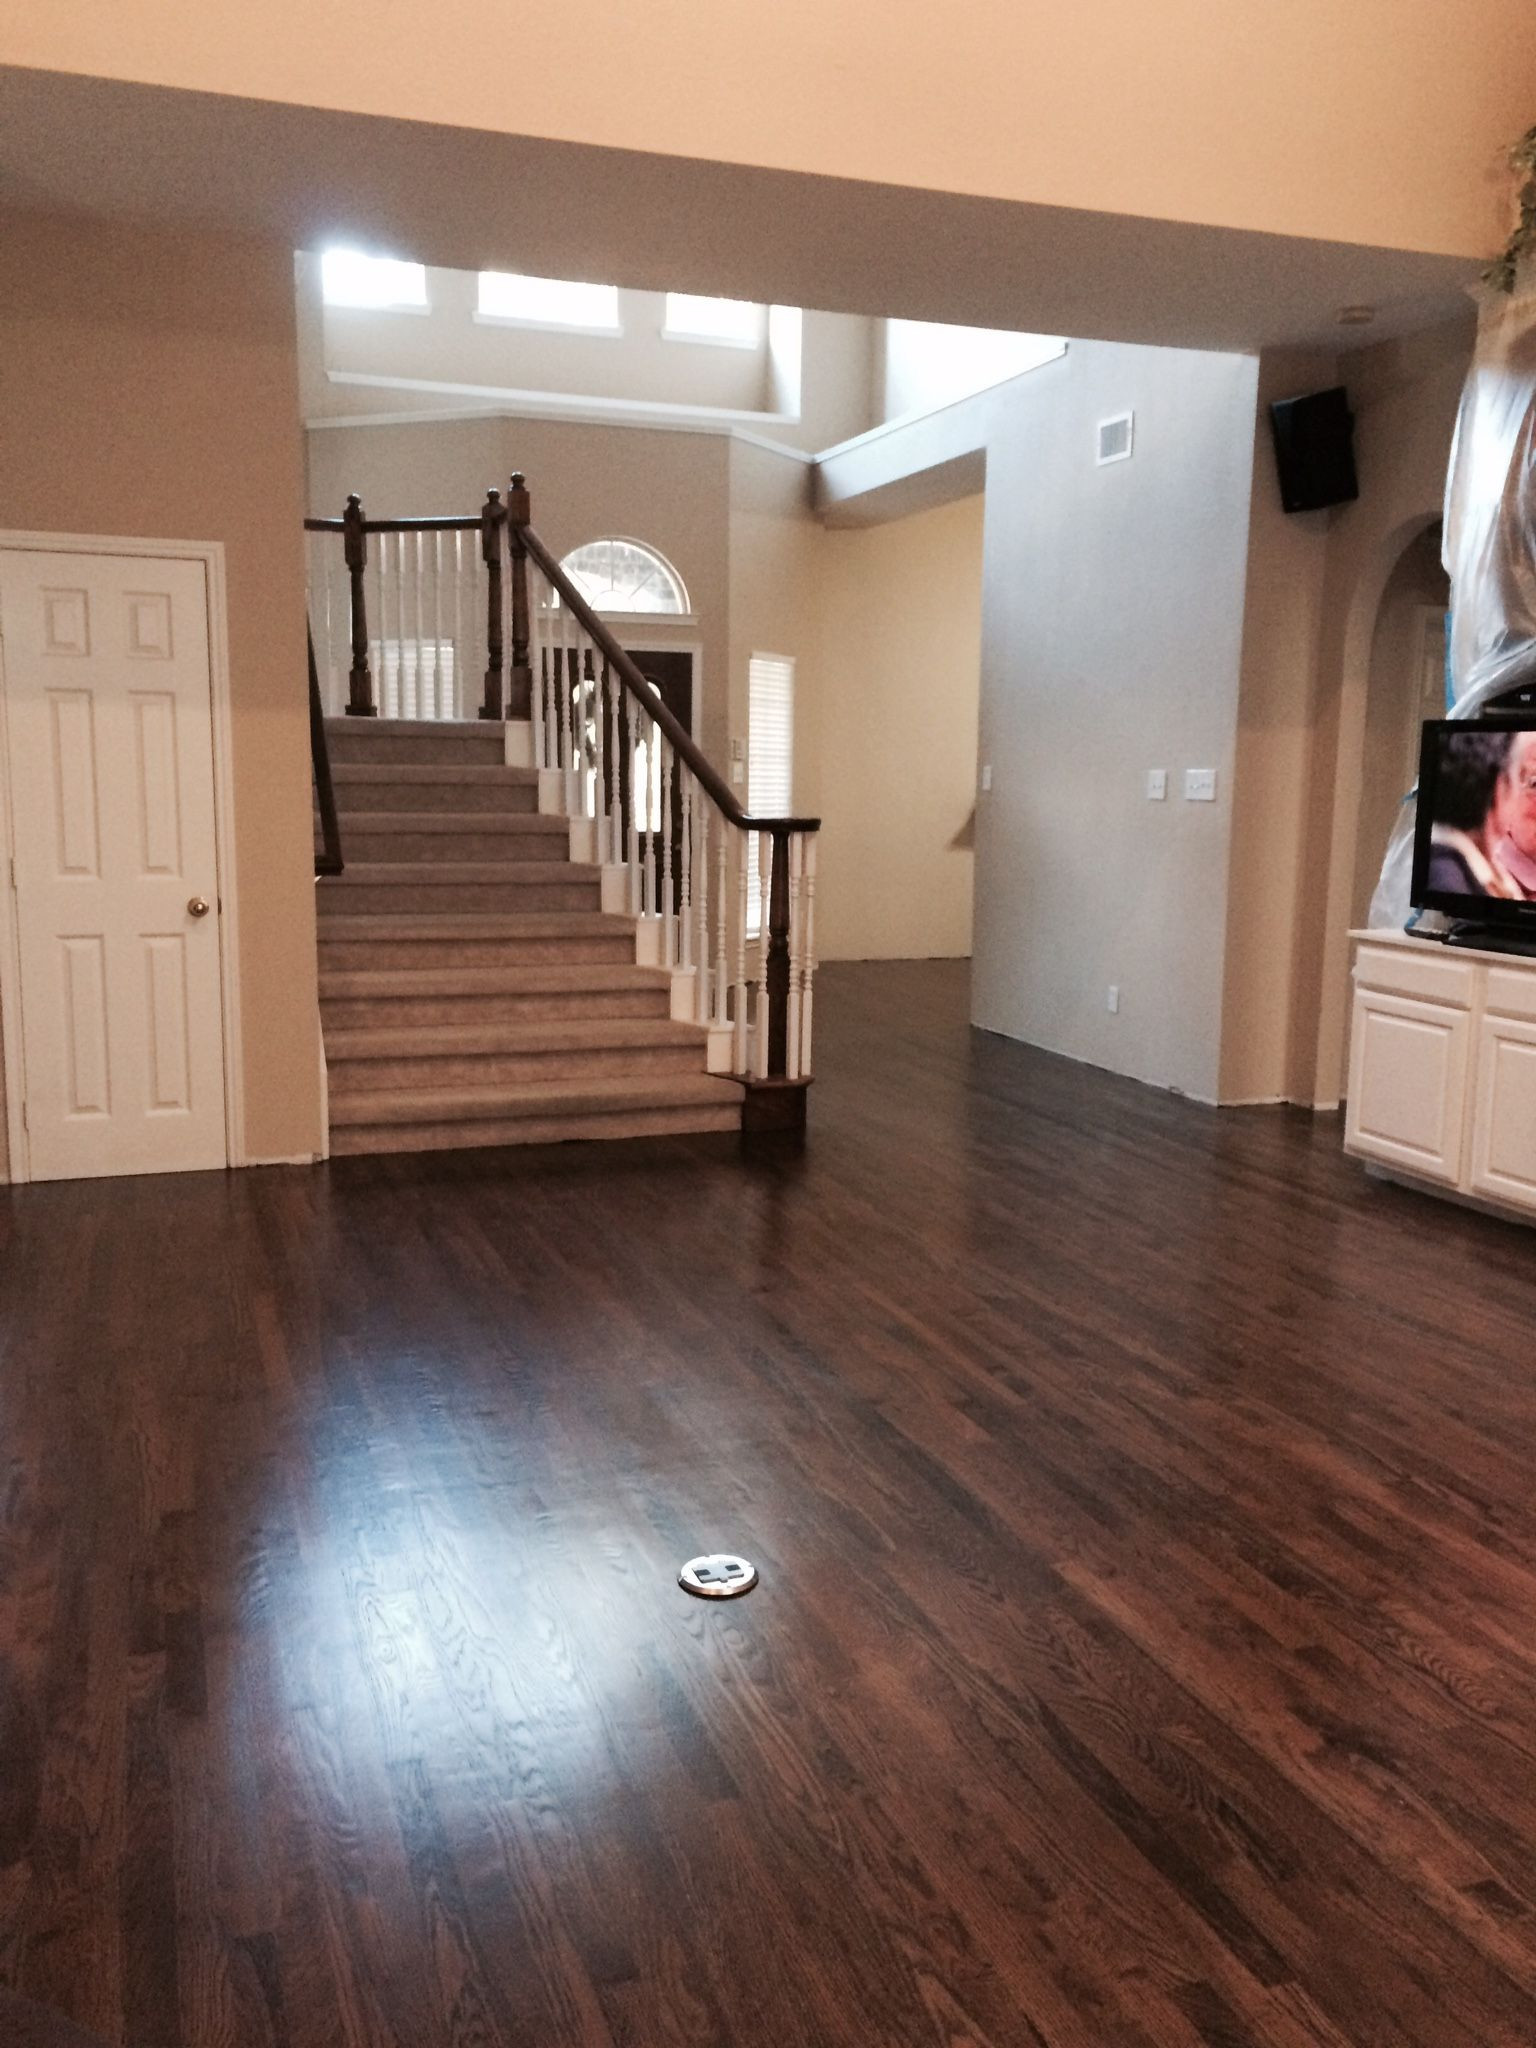 hardwood floor refinishing albuquerque of dark walnut stain on white oak hardwood remodel 1floors in 2018 with regard to dark walnut stain on white oak hardwood walnut hardwood flooring hardwood floor stain colors